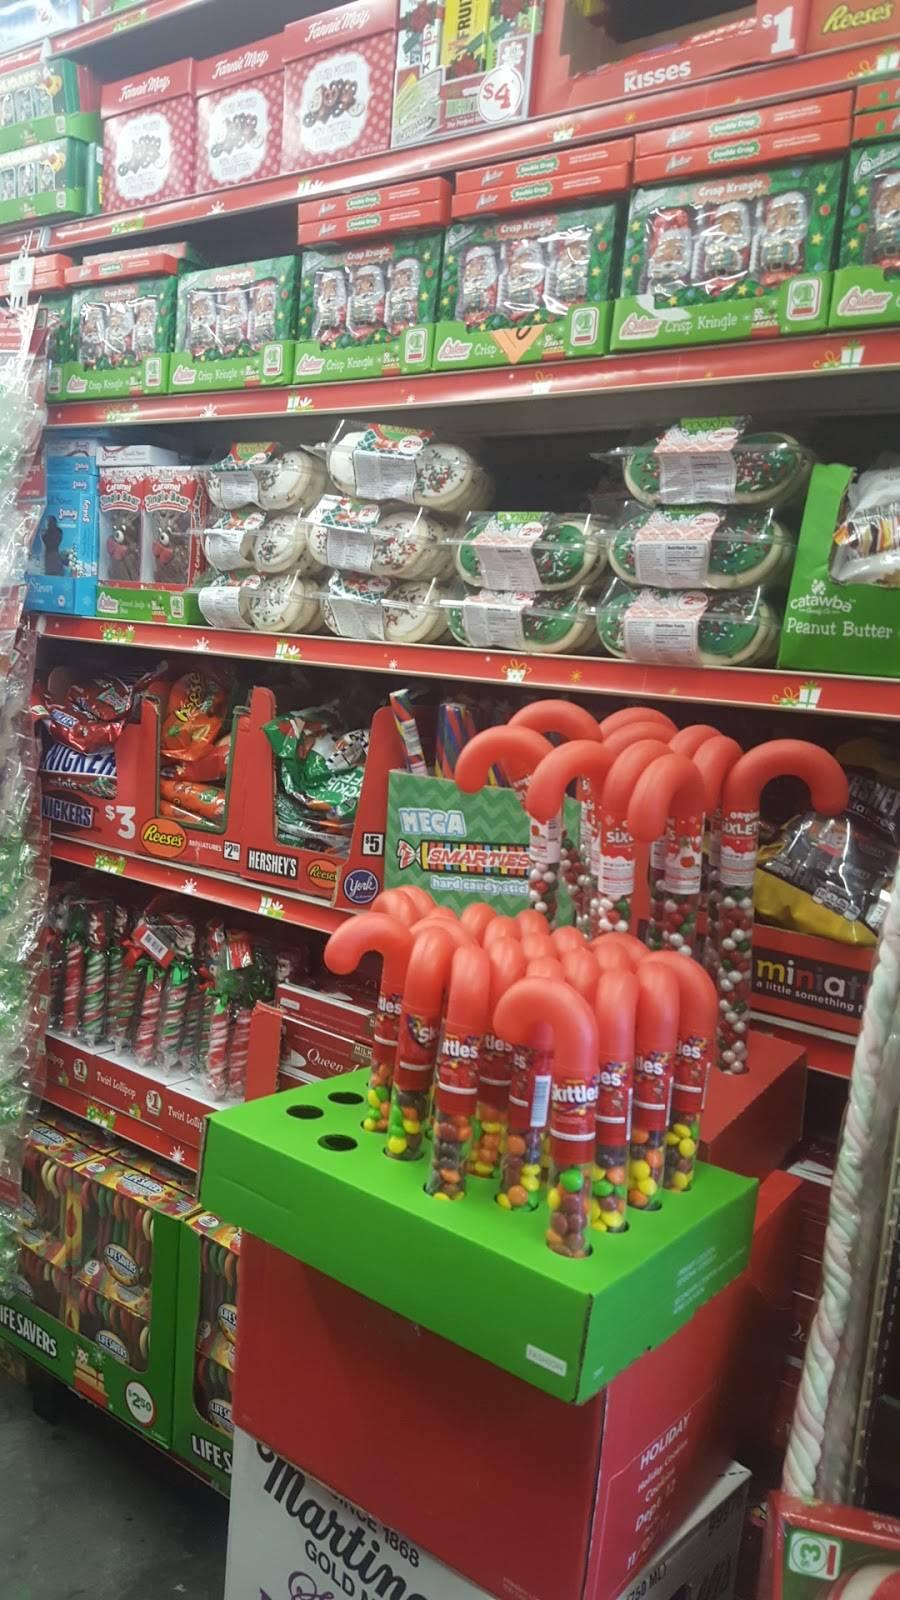 Family Dollar - supermarket  | Photo 7 of 7 | Address: 3333 Palm Ave, Hialeah, FL 33012, USA | Phone: (786) 988-6189